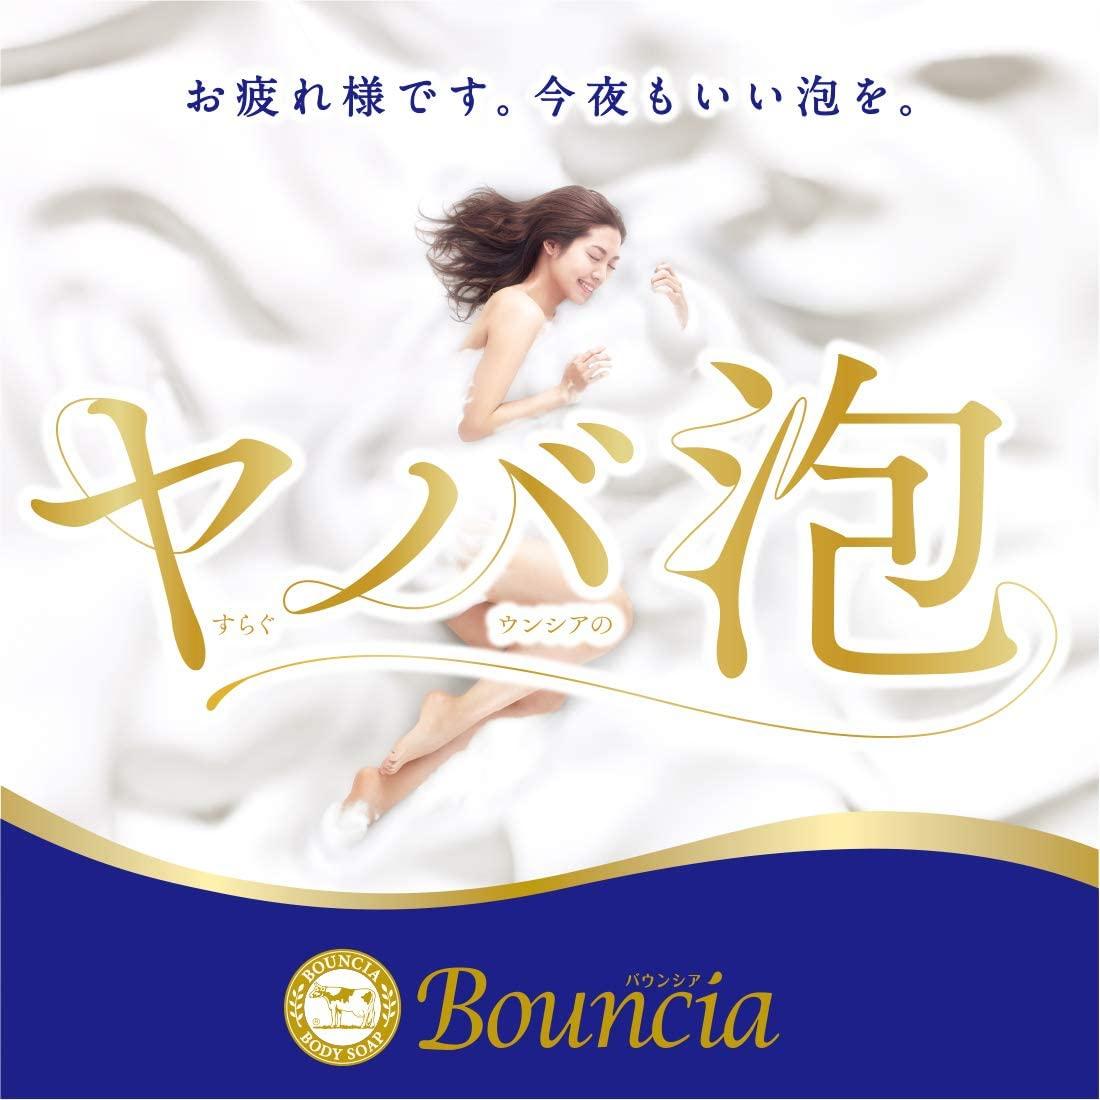 Bouncia(バウンシア)ボディソープの商品画像7